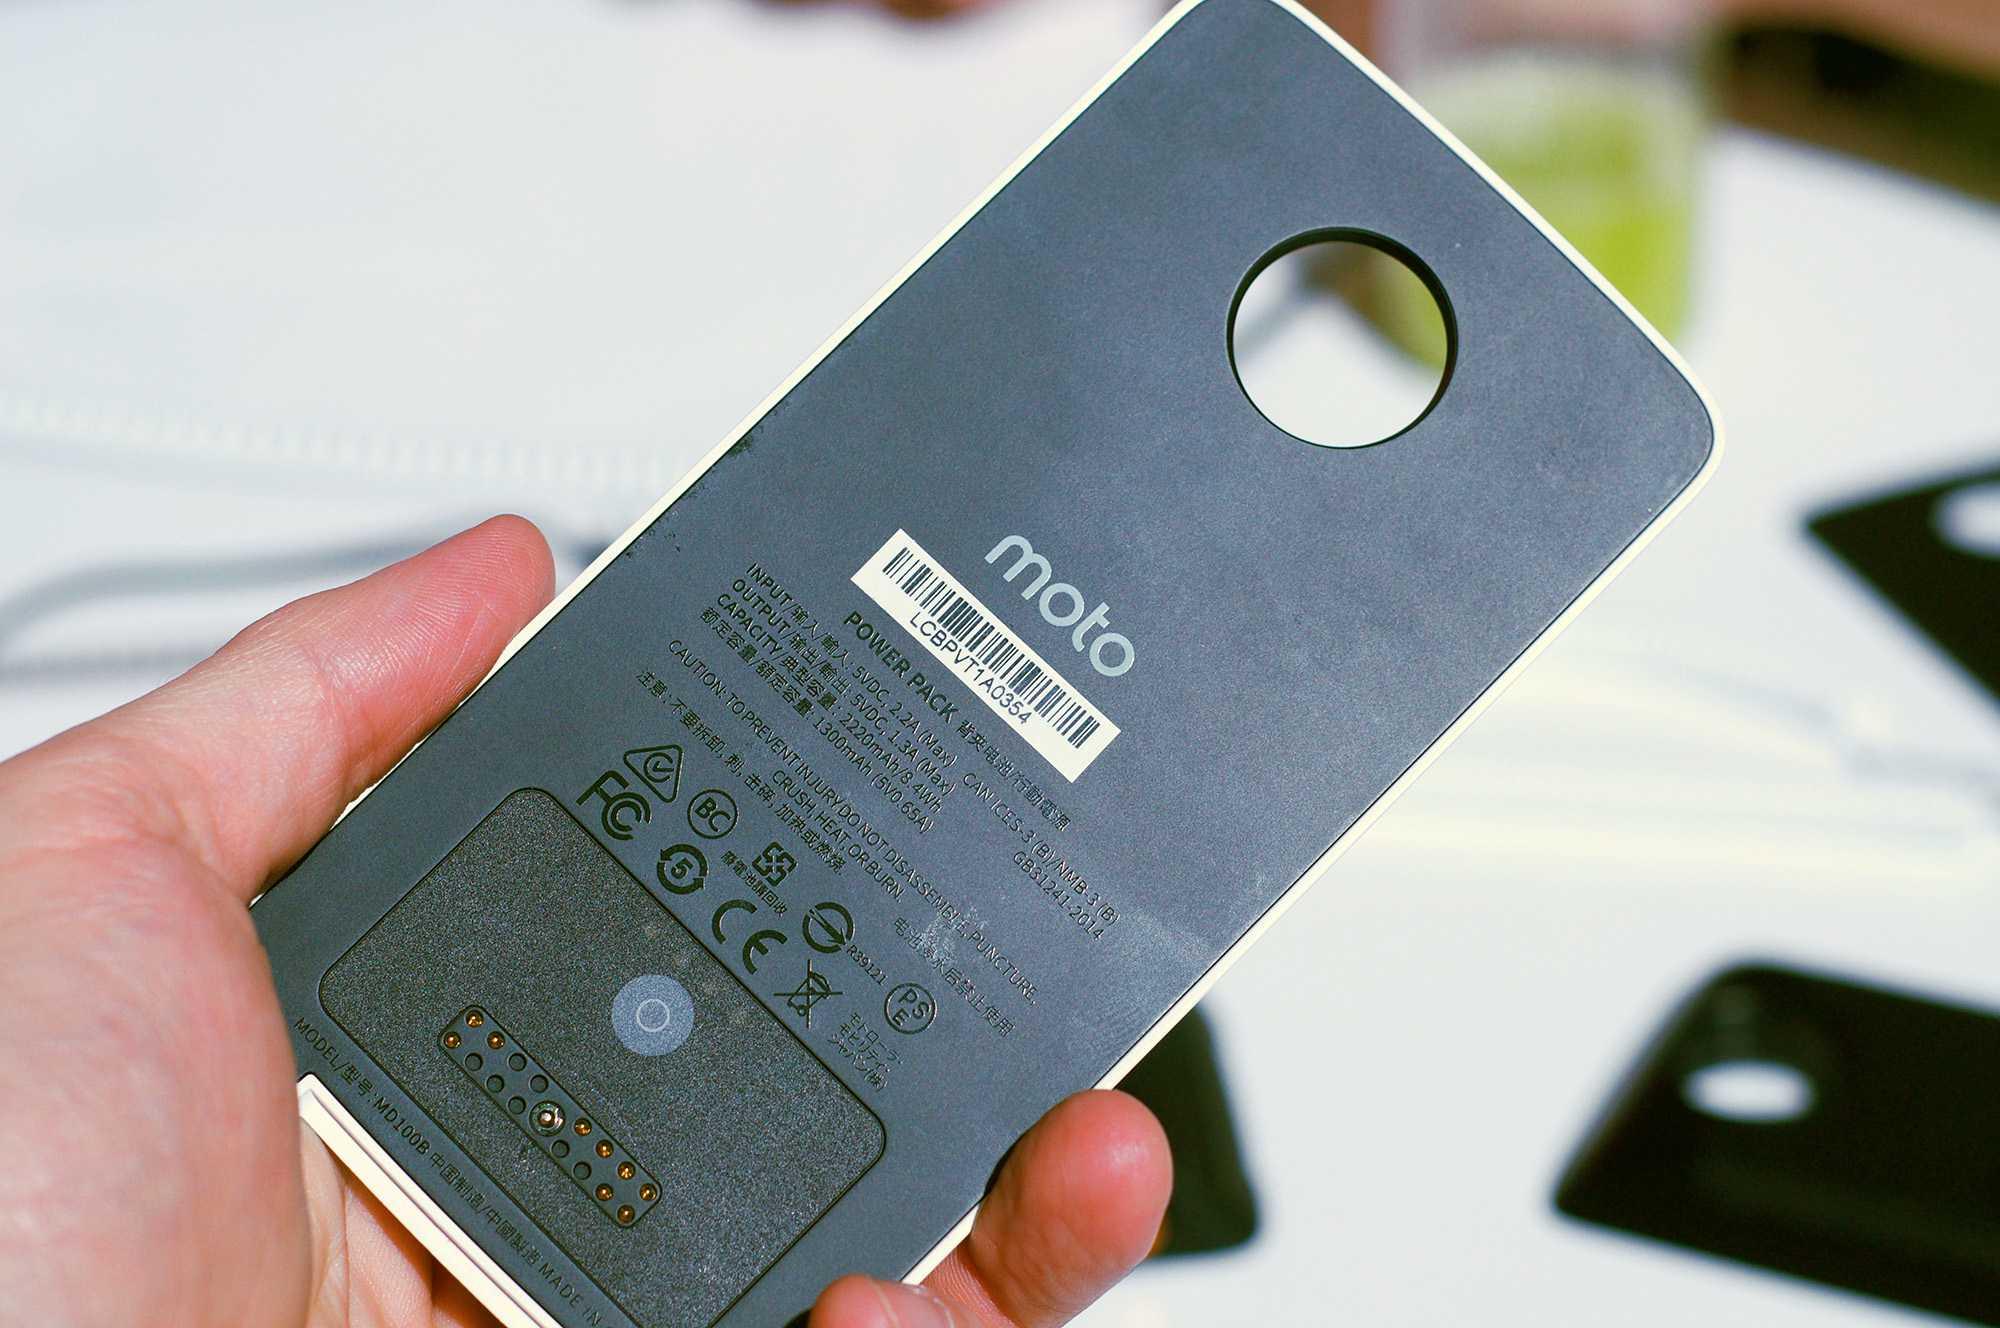 Обзор motorola one fusion plus - цена, купить, дата выхода, характеристики, фото - новинки электроники